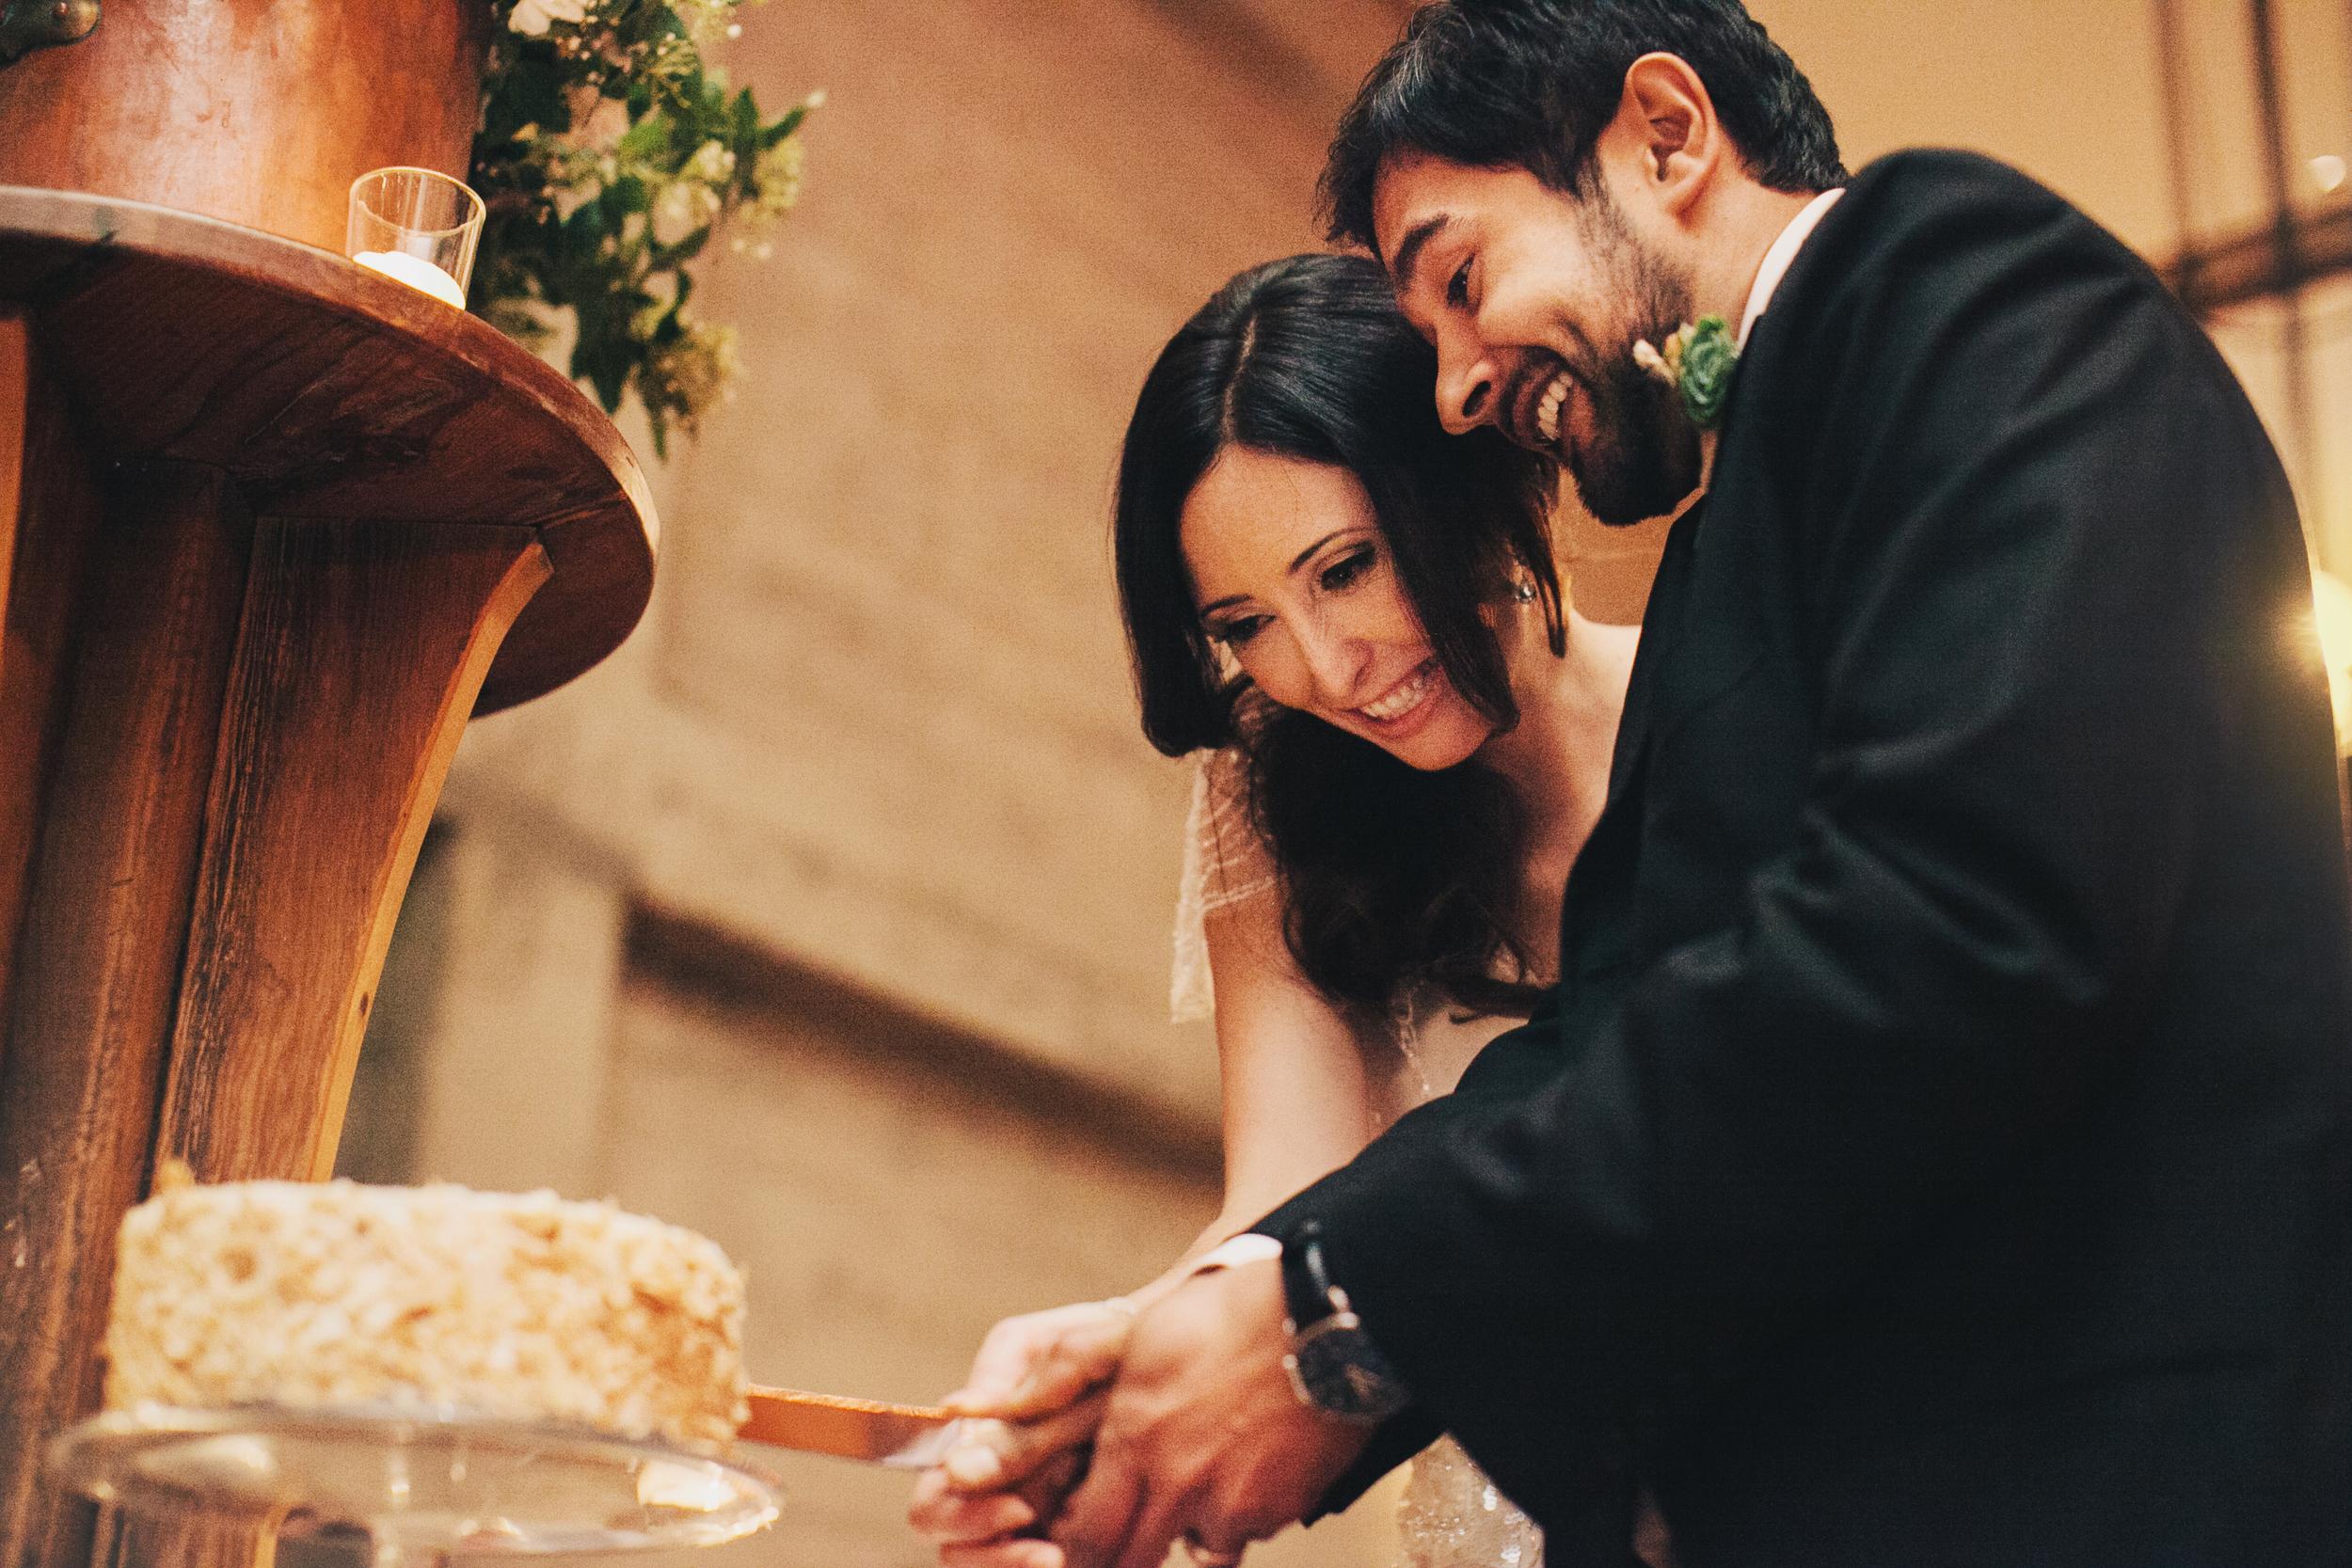 Foreign_Cinema_Wedding_Photography-30.JPG